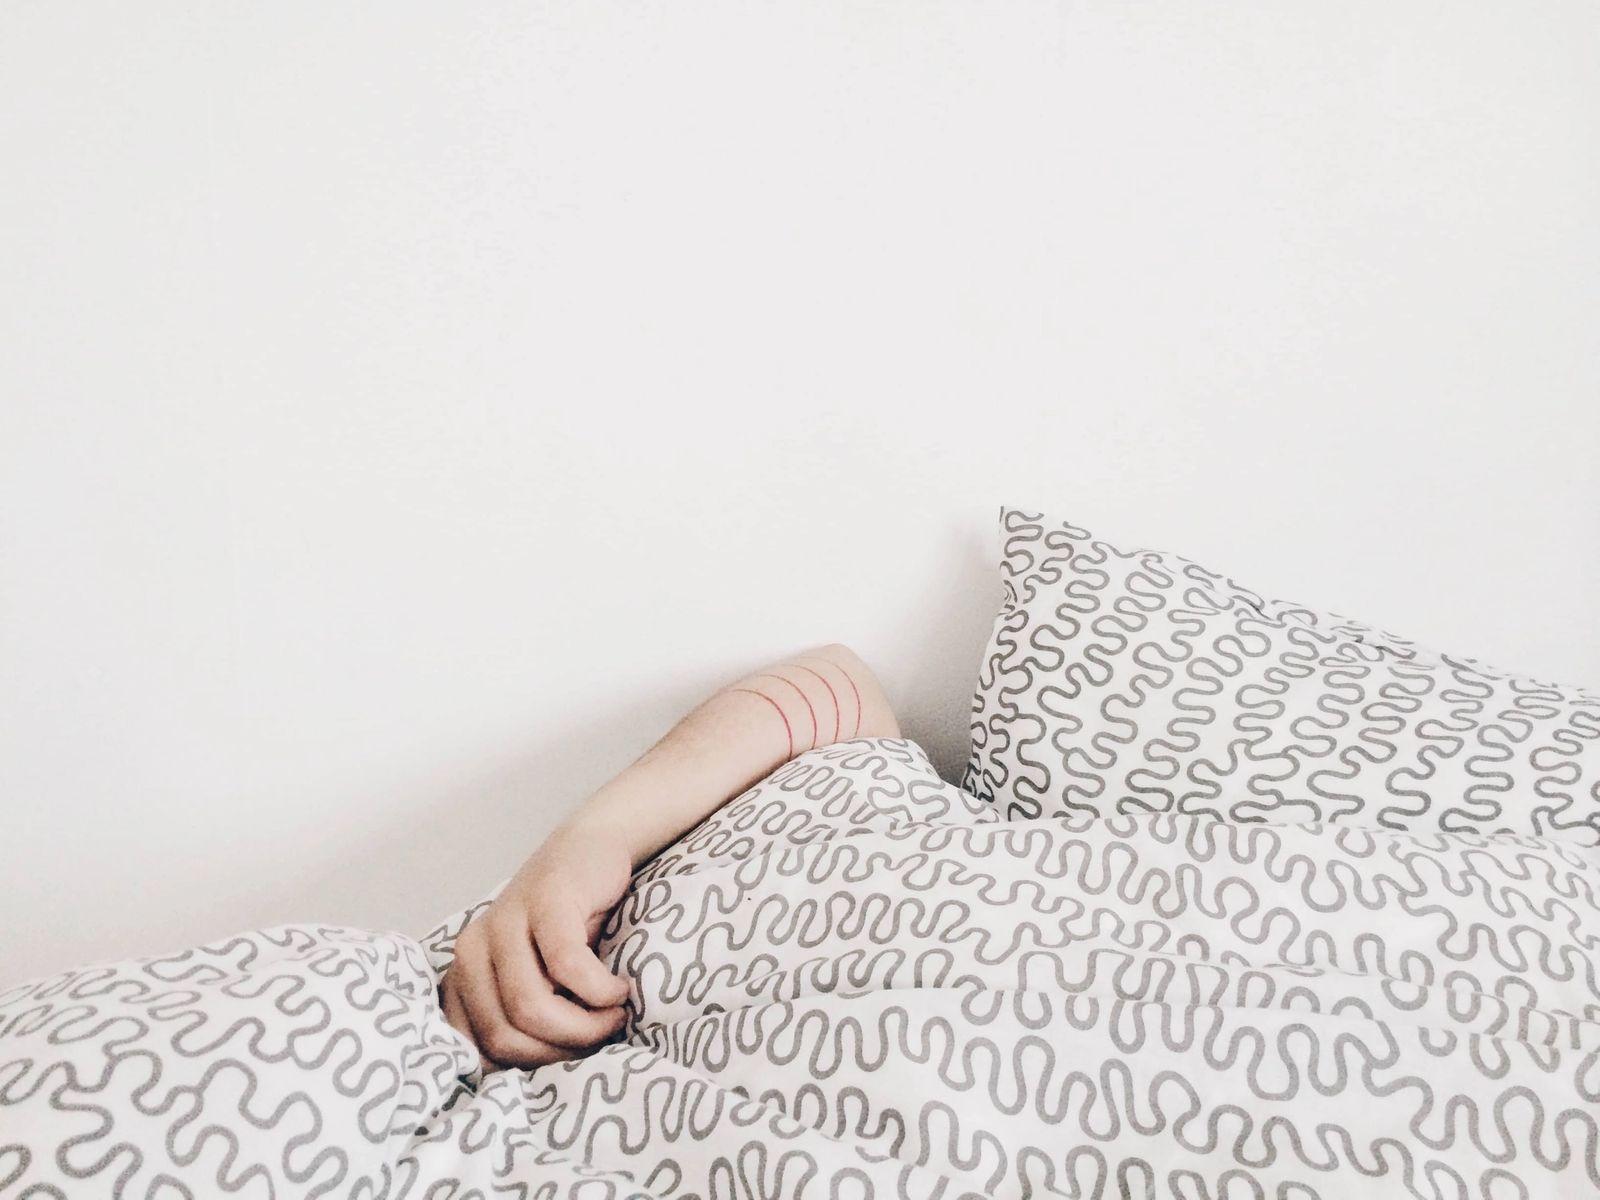 Person lazing under quilt blanket.